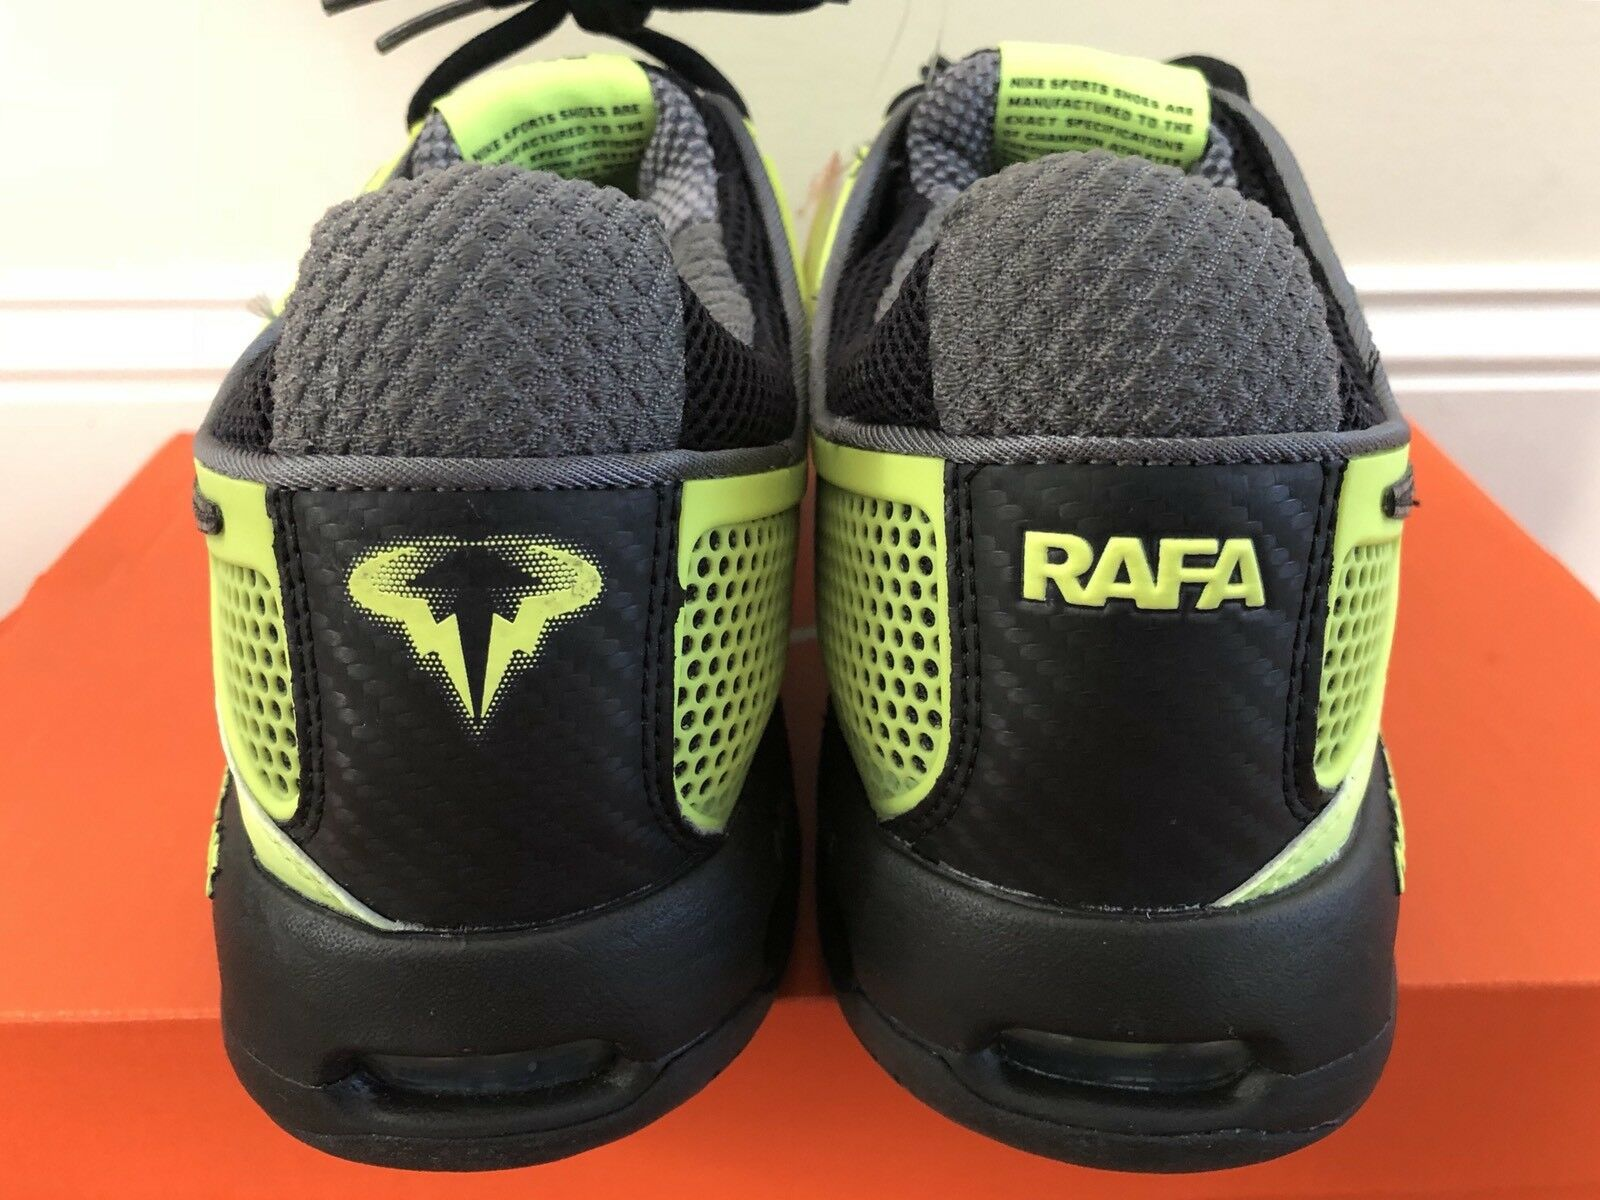 Glow in dark 2010 nike courtballistec 2.3 Nadal tennis shoes federer sz7.5 read